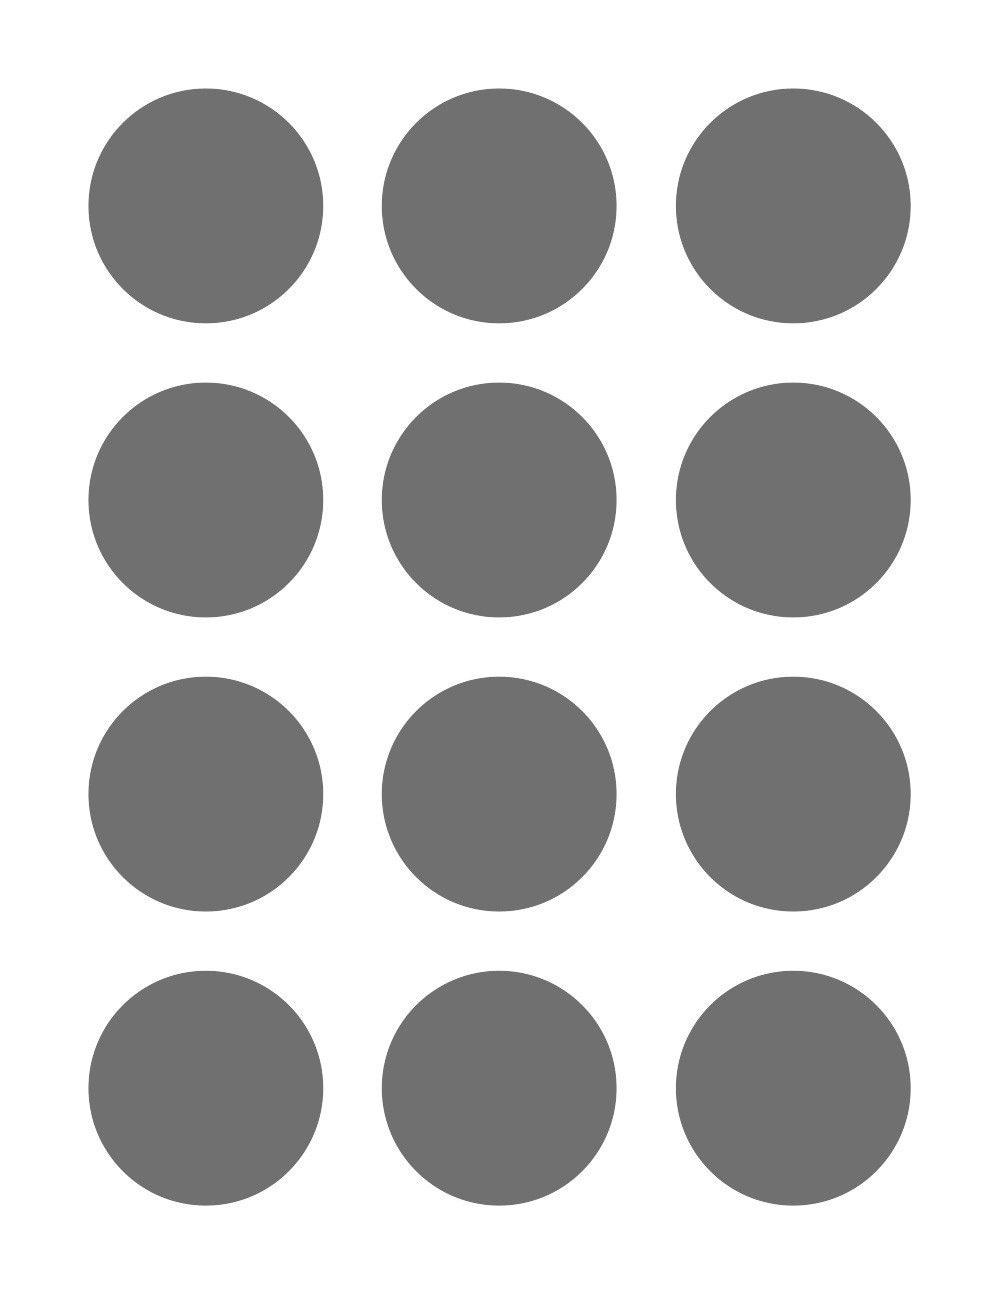 Psd Template 12 Circles 2 Inch Diameter Etsy